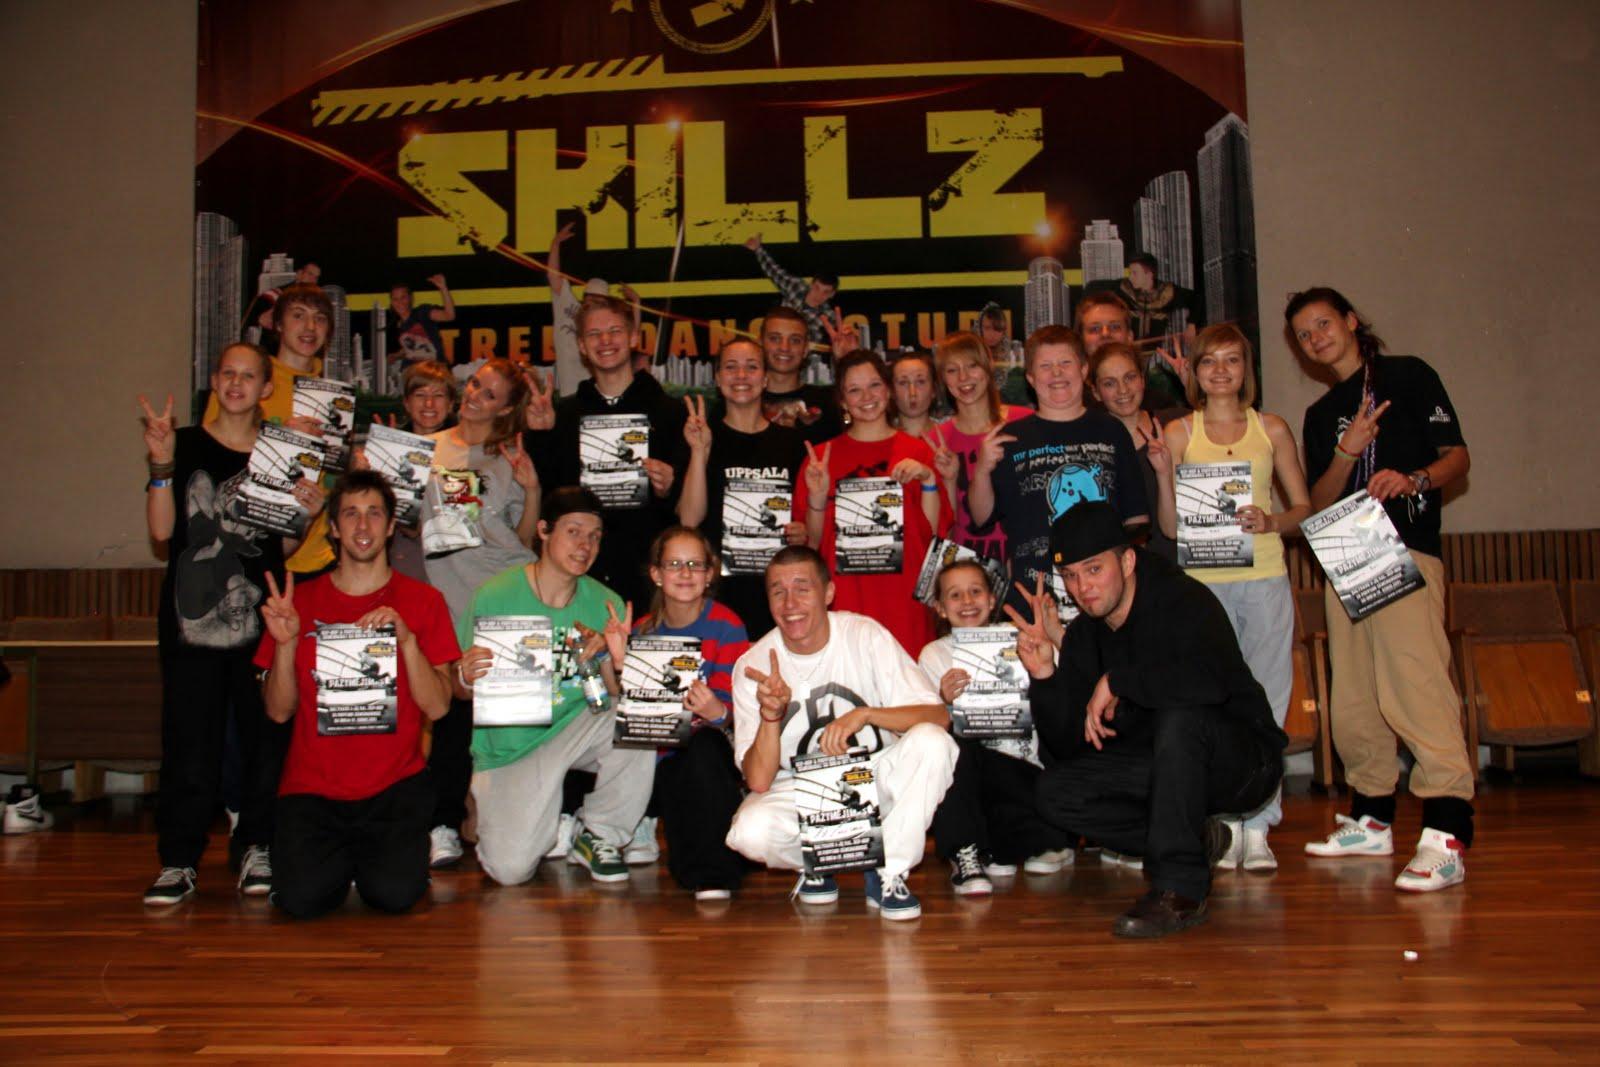 Dre10 Workshop @SKILLZ - IMG_5738.JPG